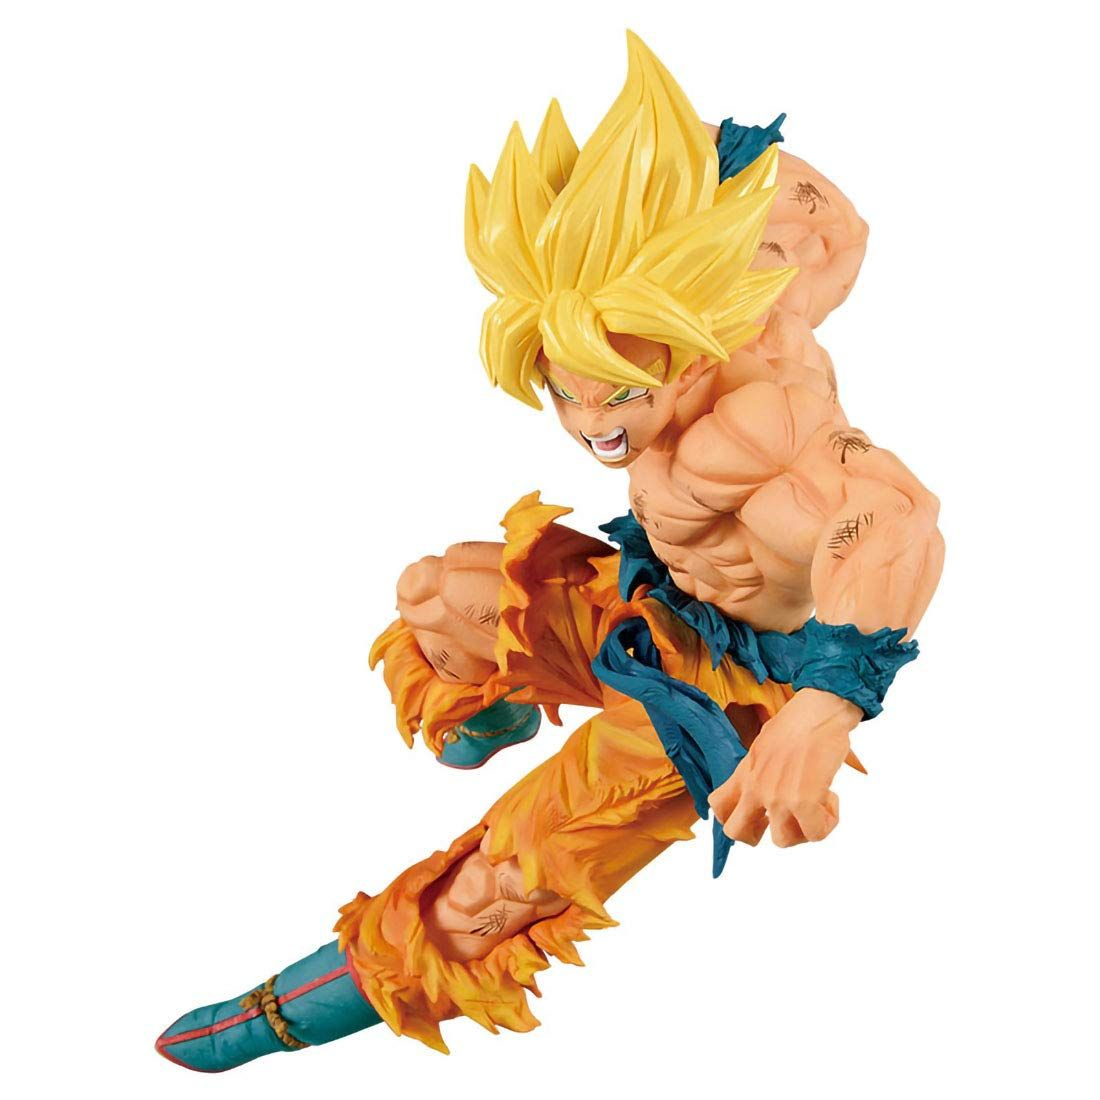 IMPORT JAPON Banpresto Dragon Ball Figurine MATCH MAKERS BROLY SUPER SAIYAN